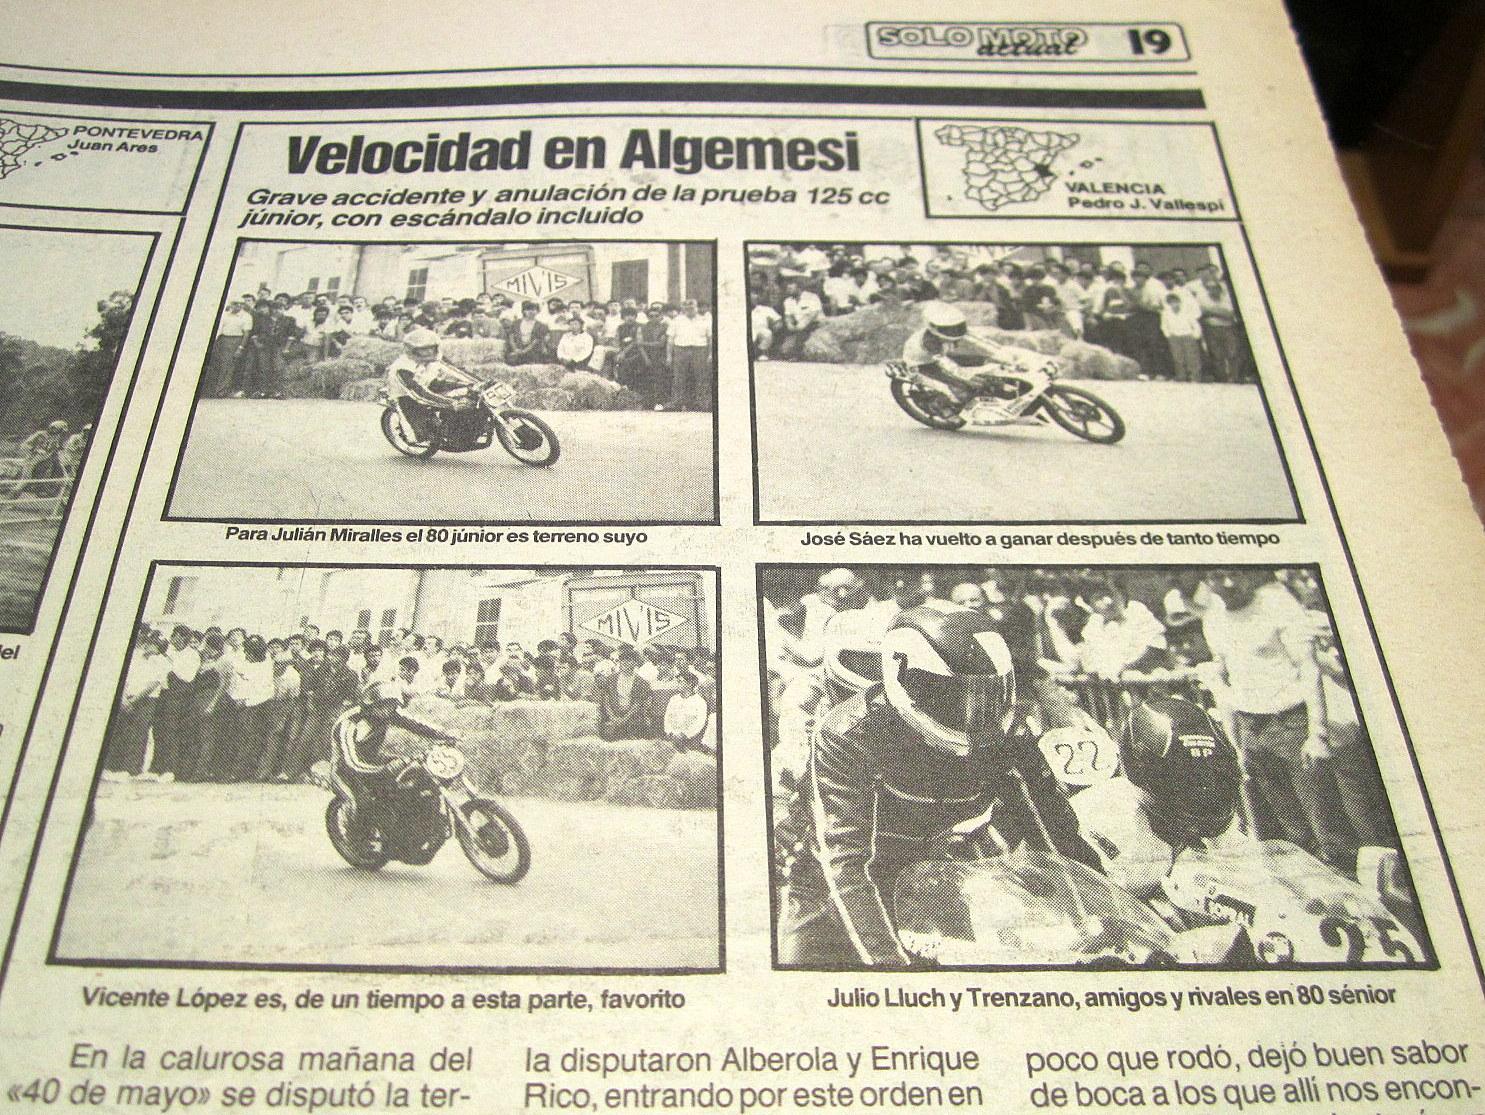 Antiguos pilotos: José Luis Gallego (V) 1qfuw6